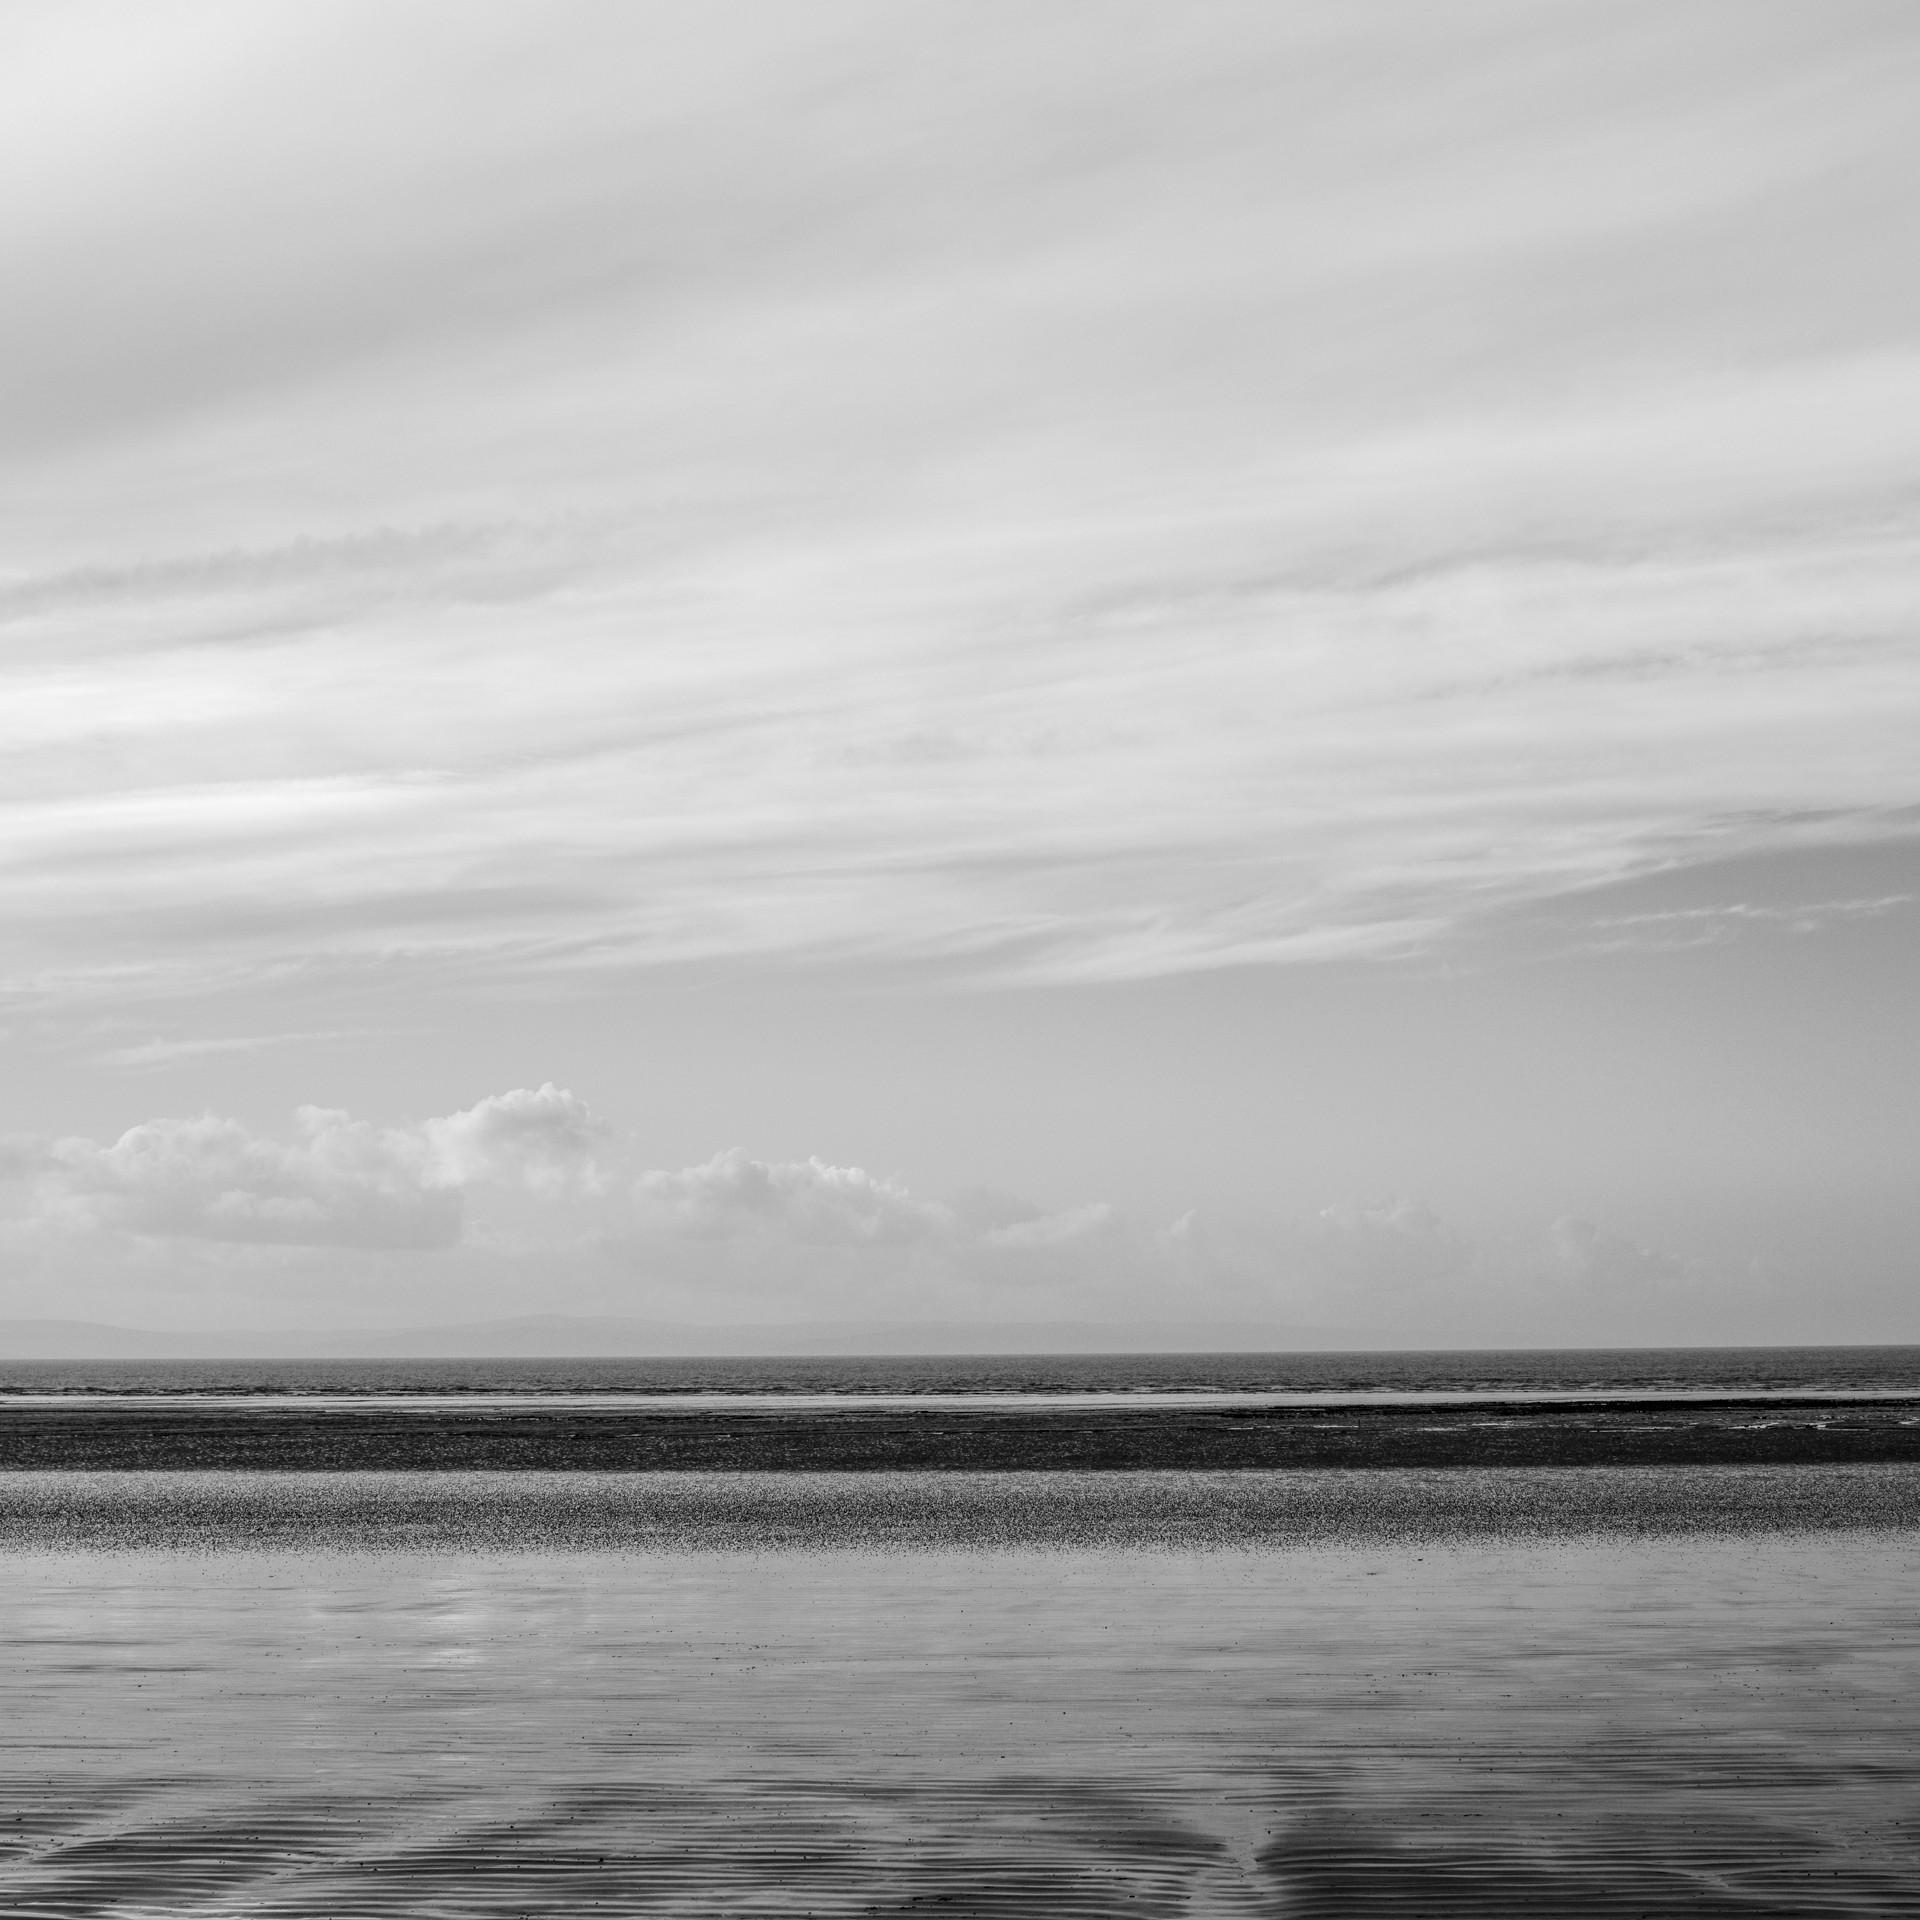 Weston-super-Mare, Somerset UK - Février 2019 #5